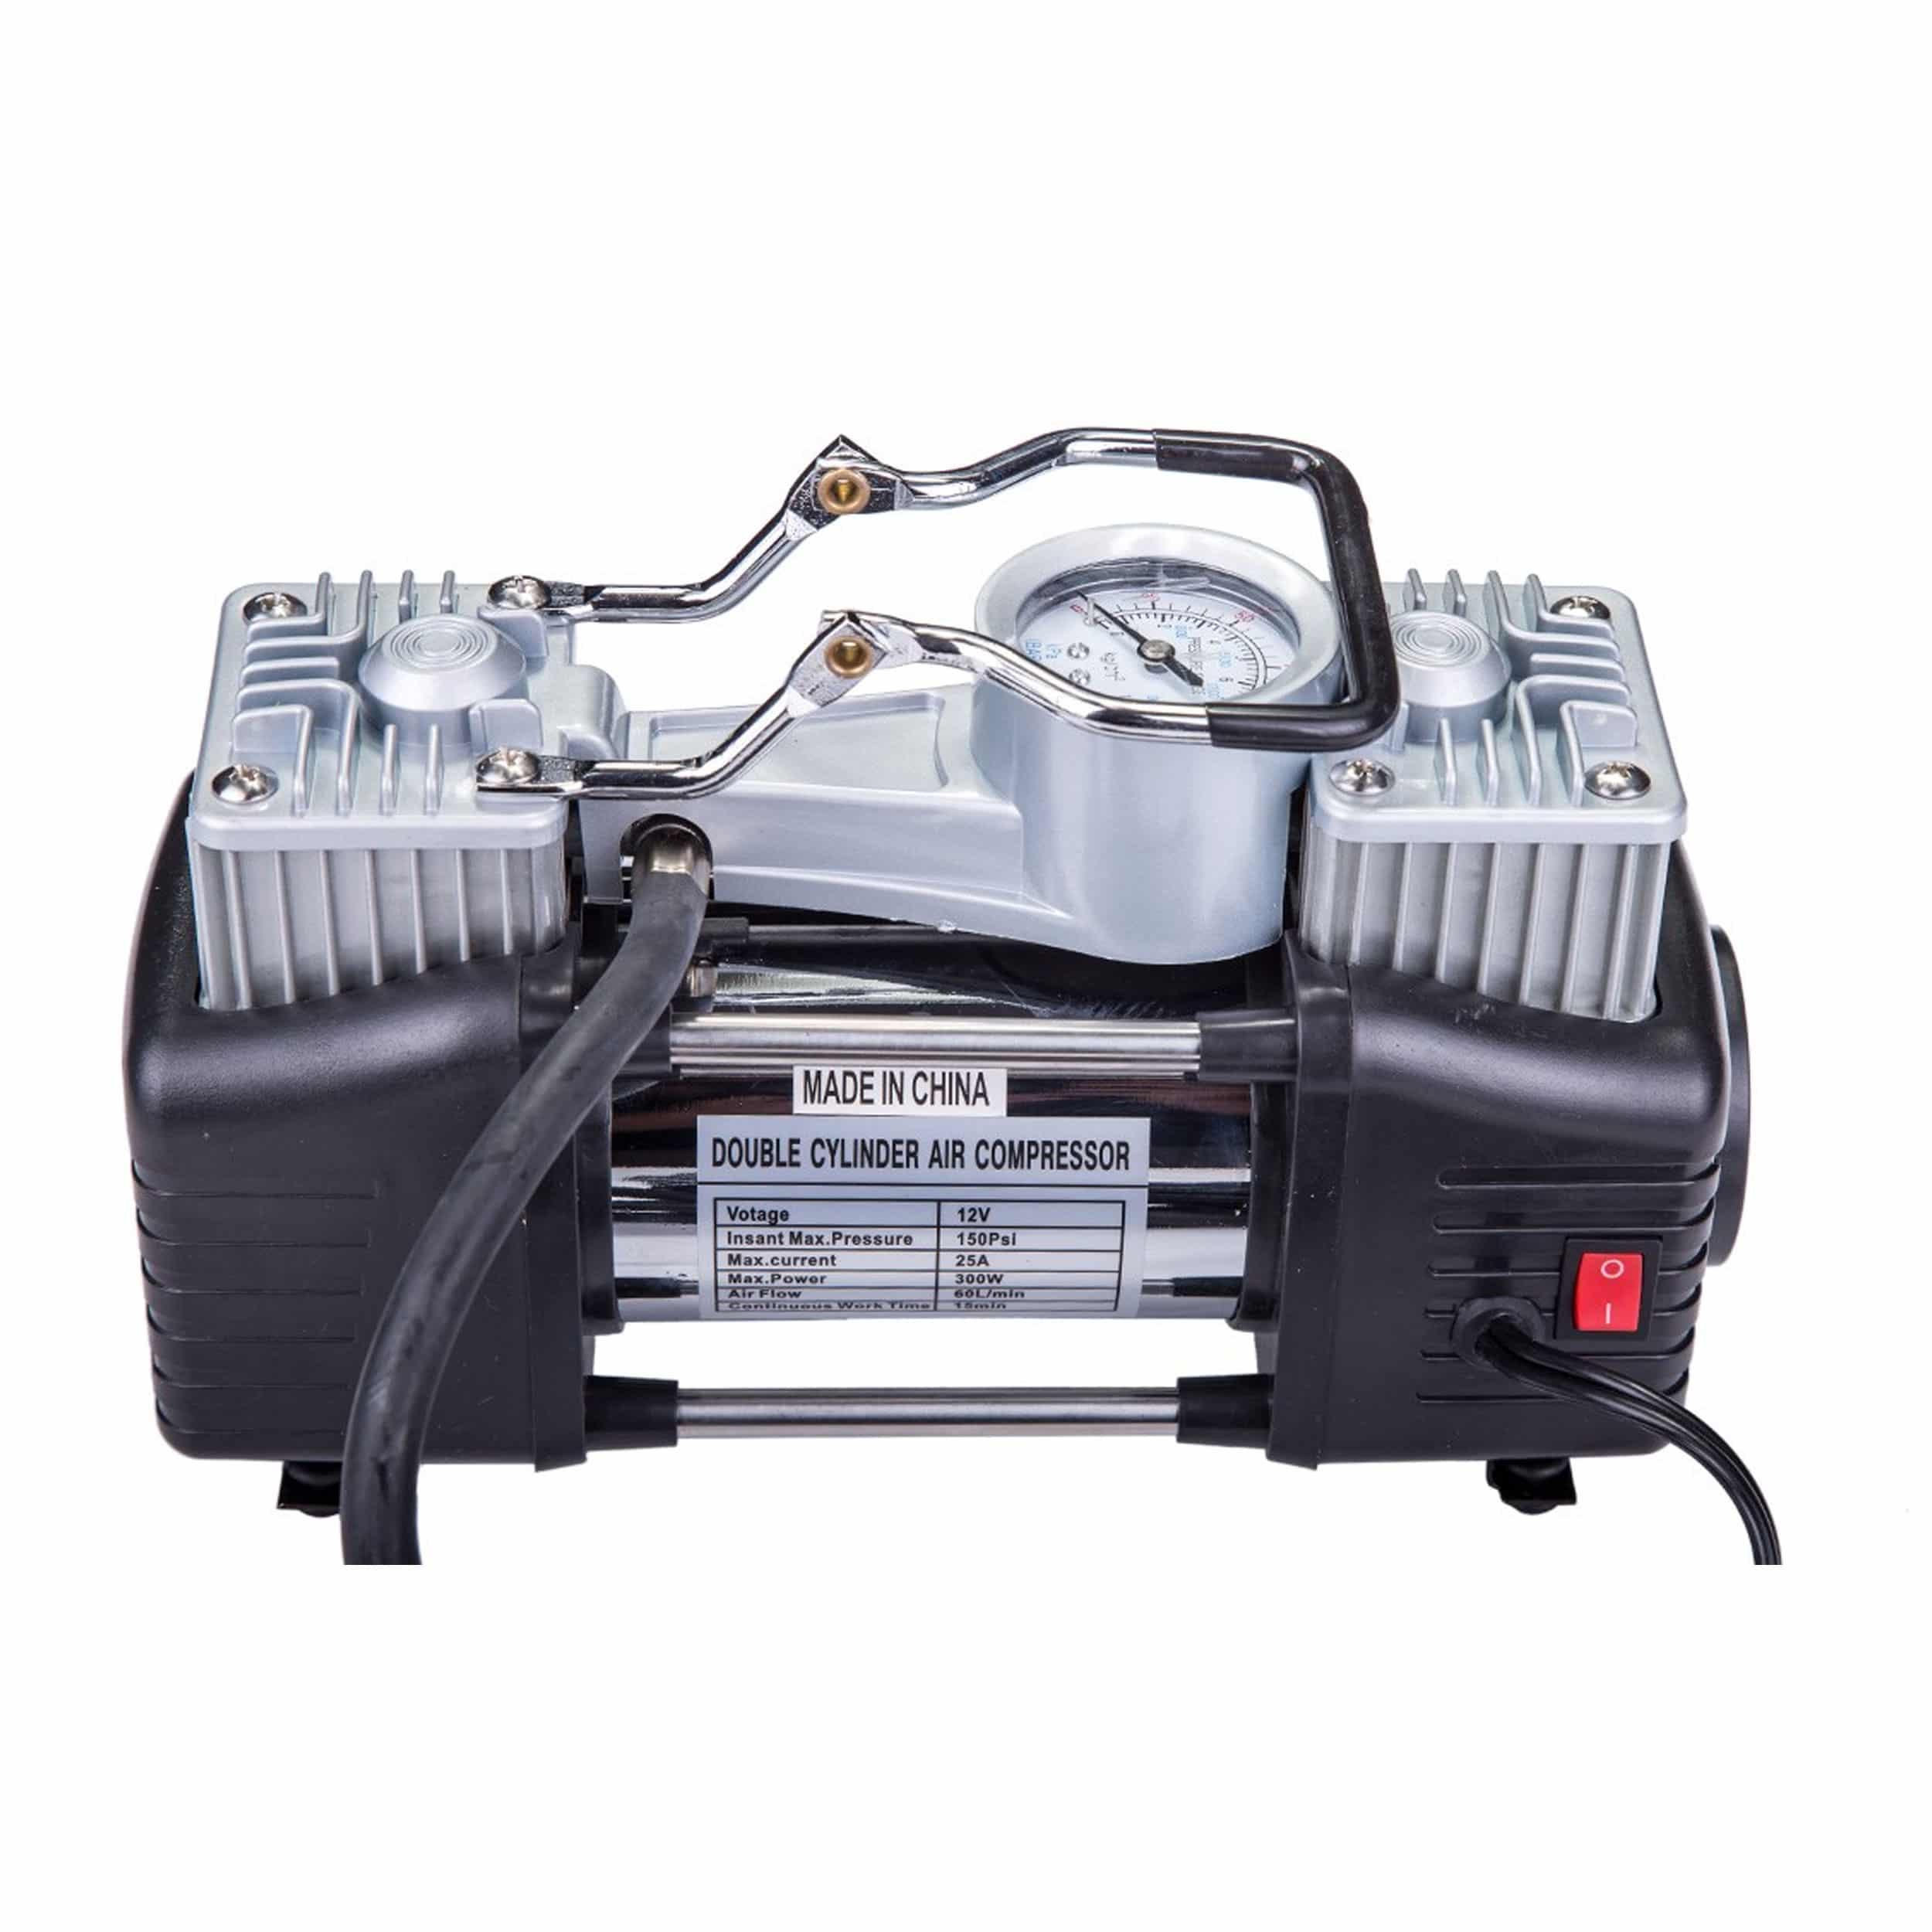 قیمت کمپرسور باد فندکی ایکس سان مدل TS2